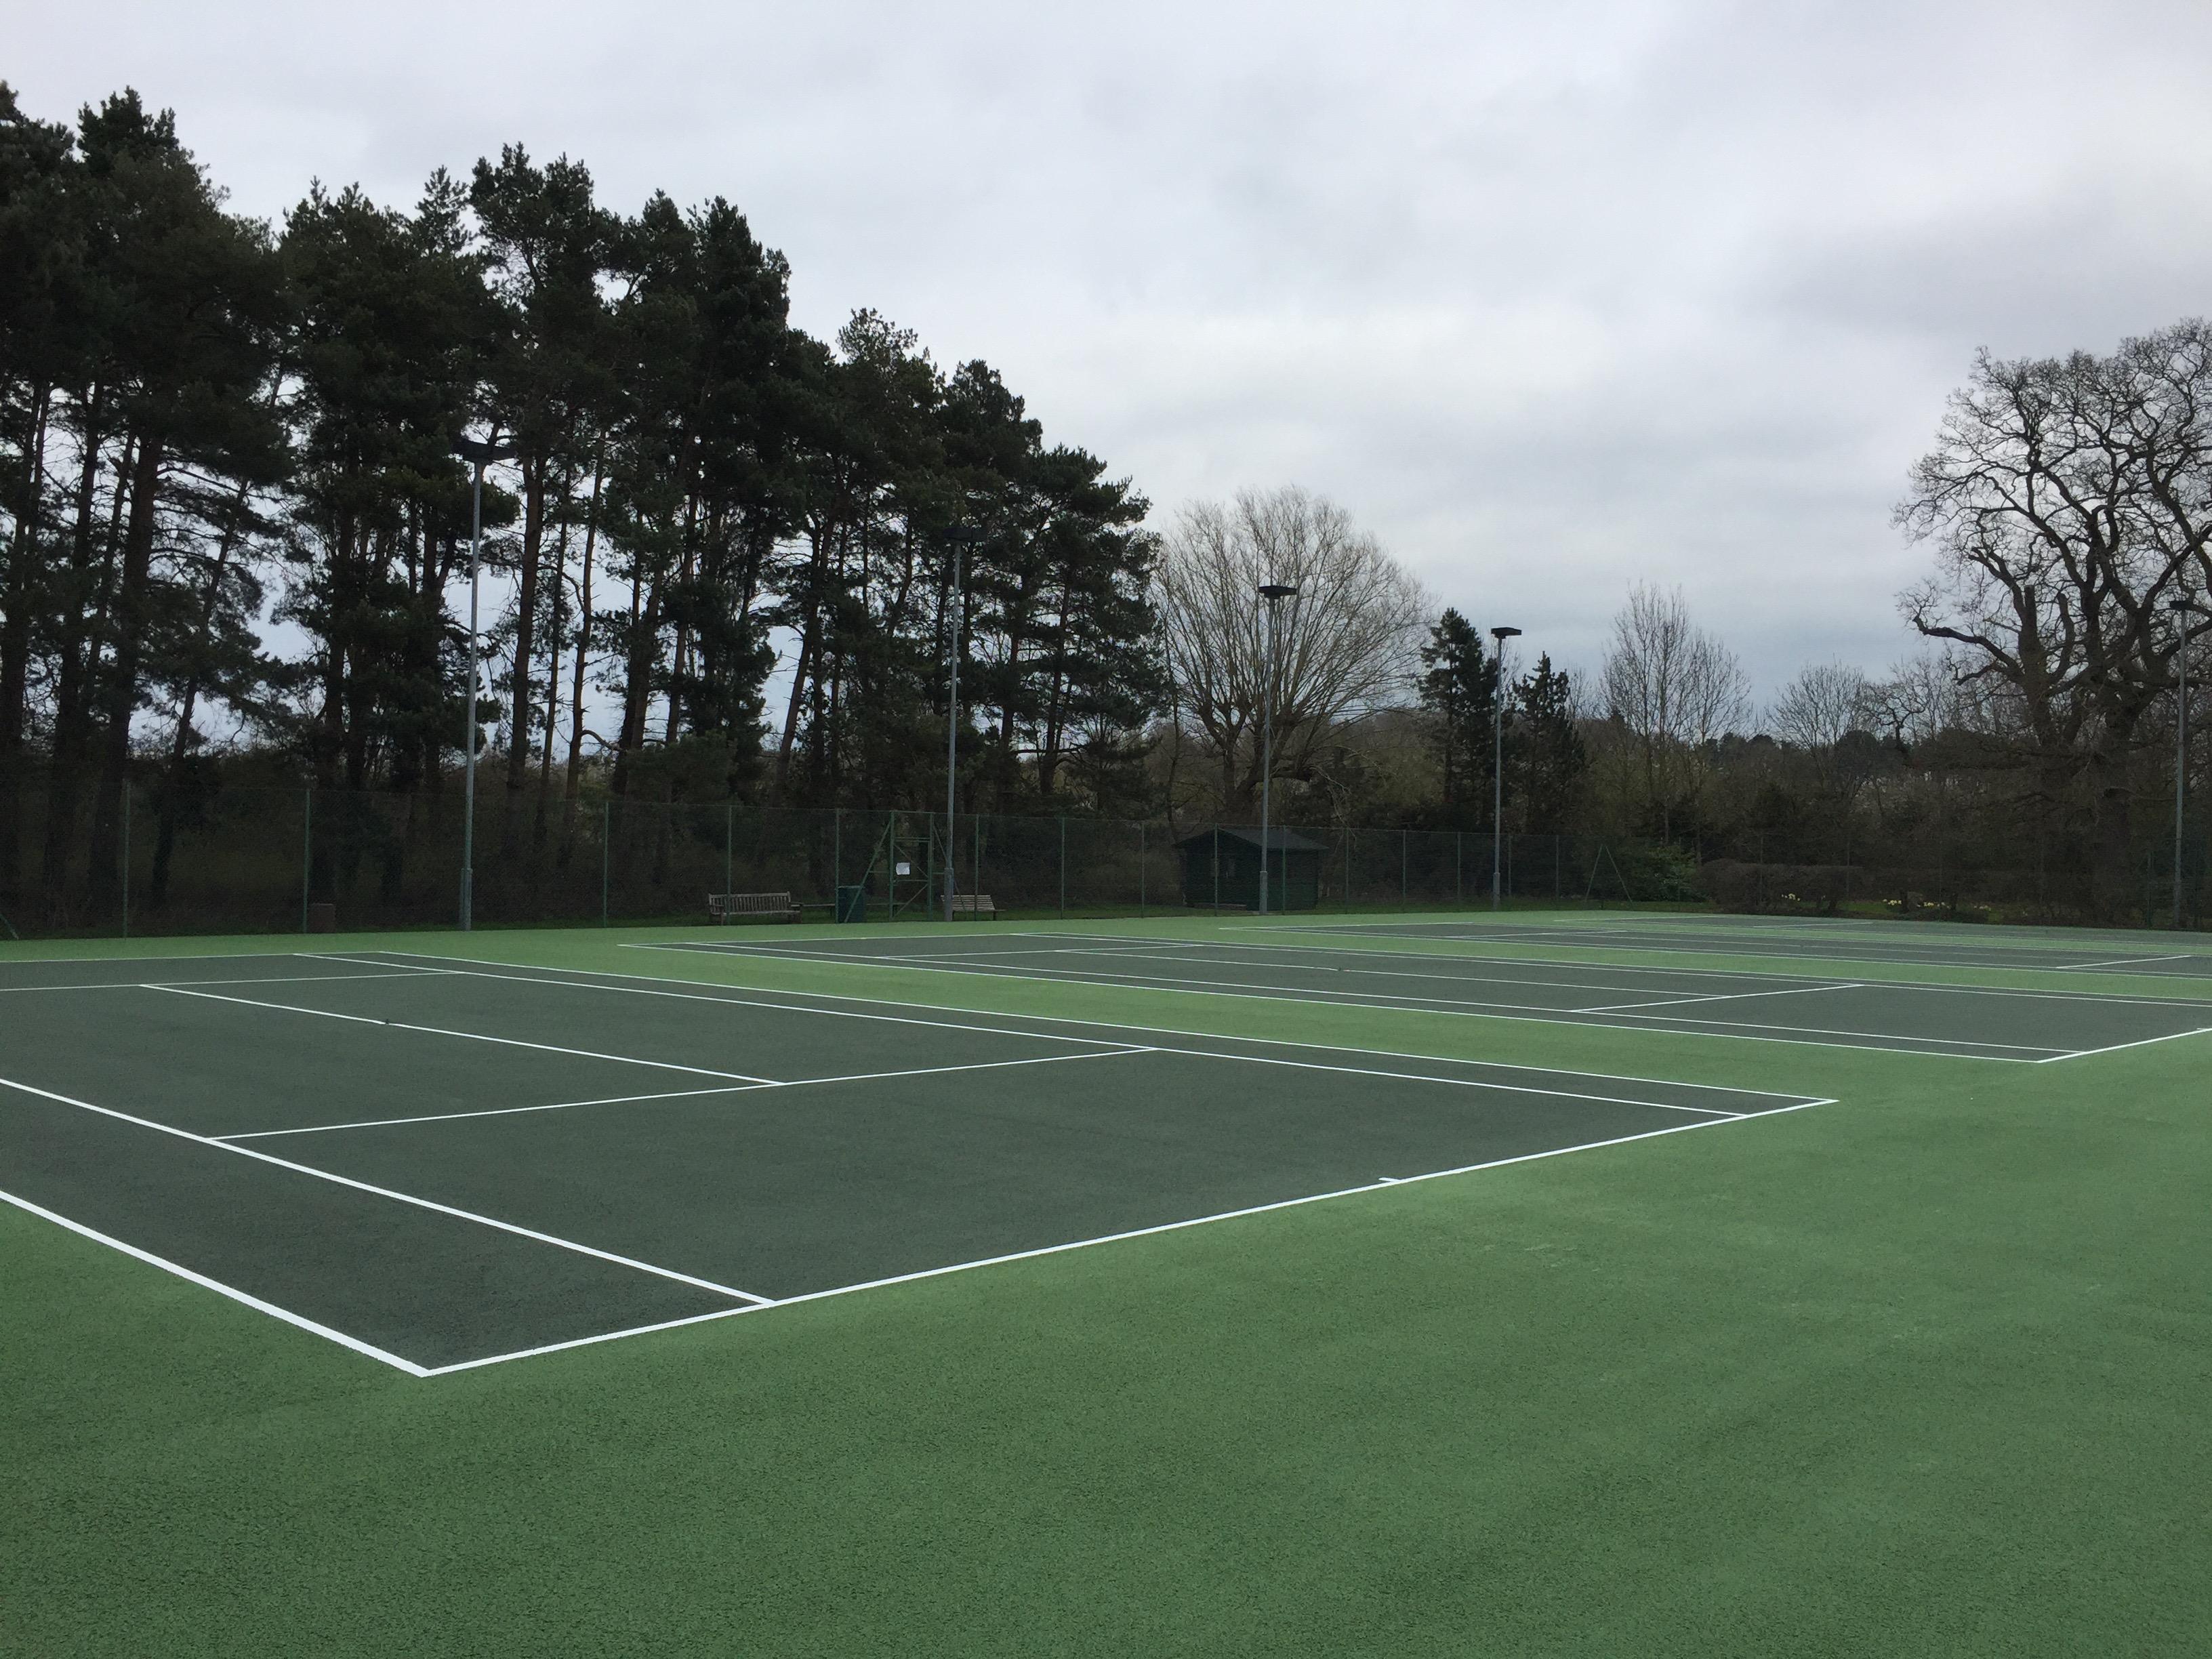 MK Tennis After SCSPorts